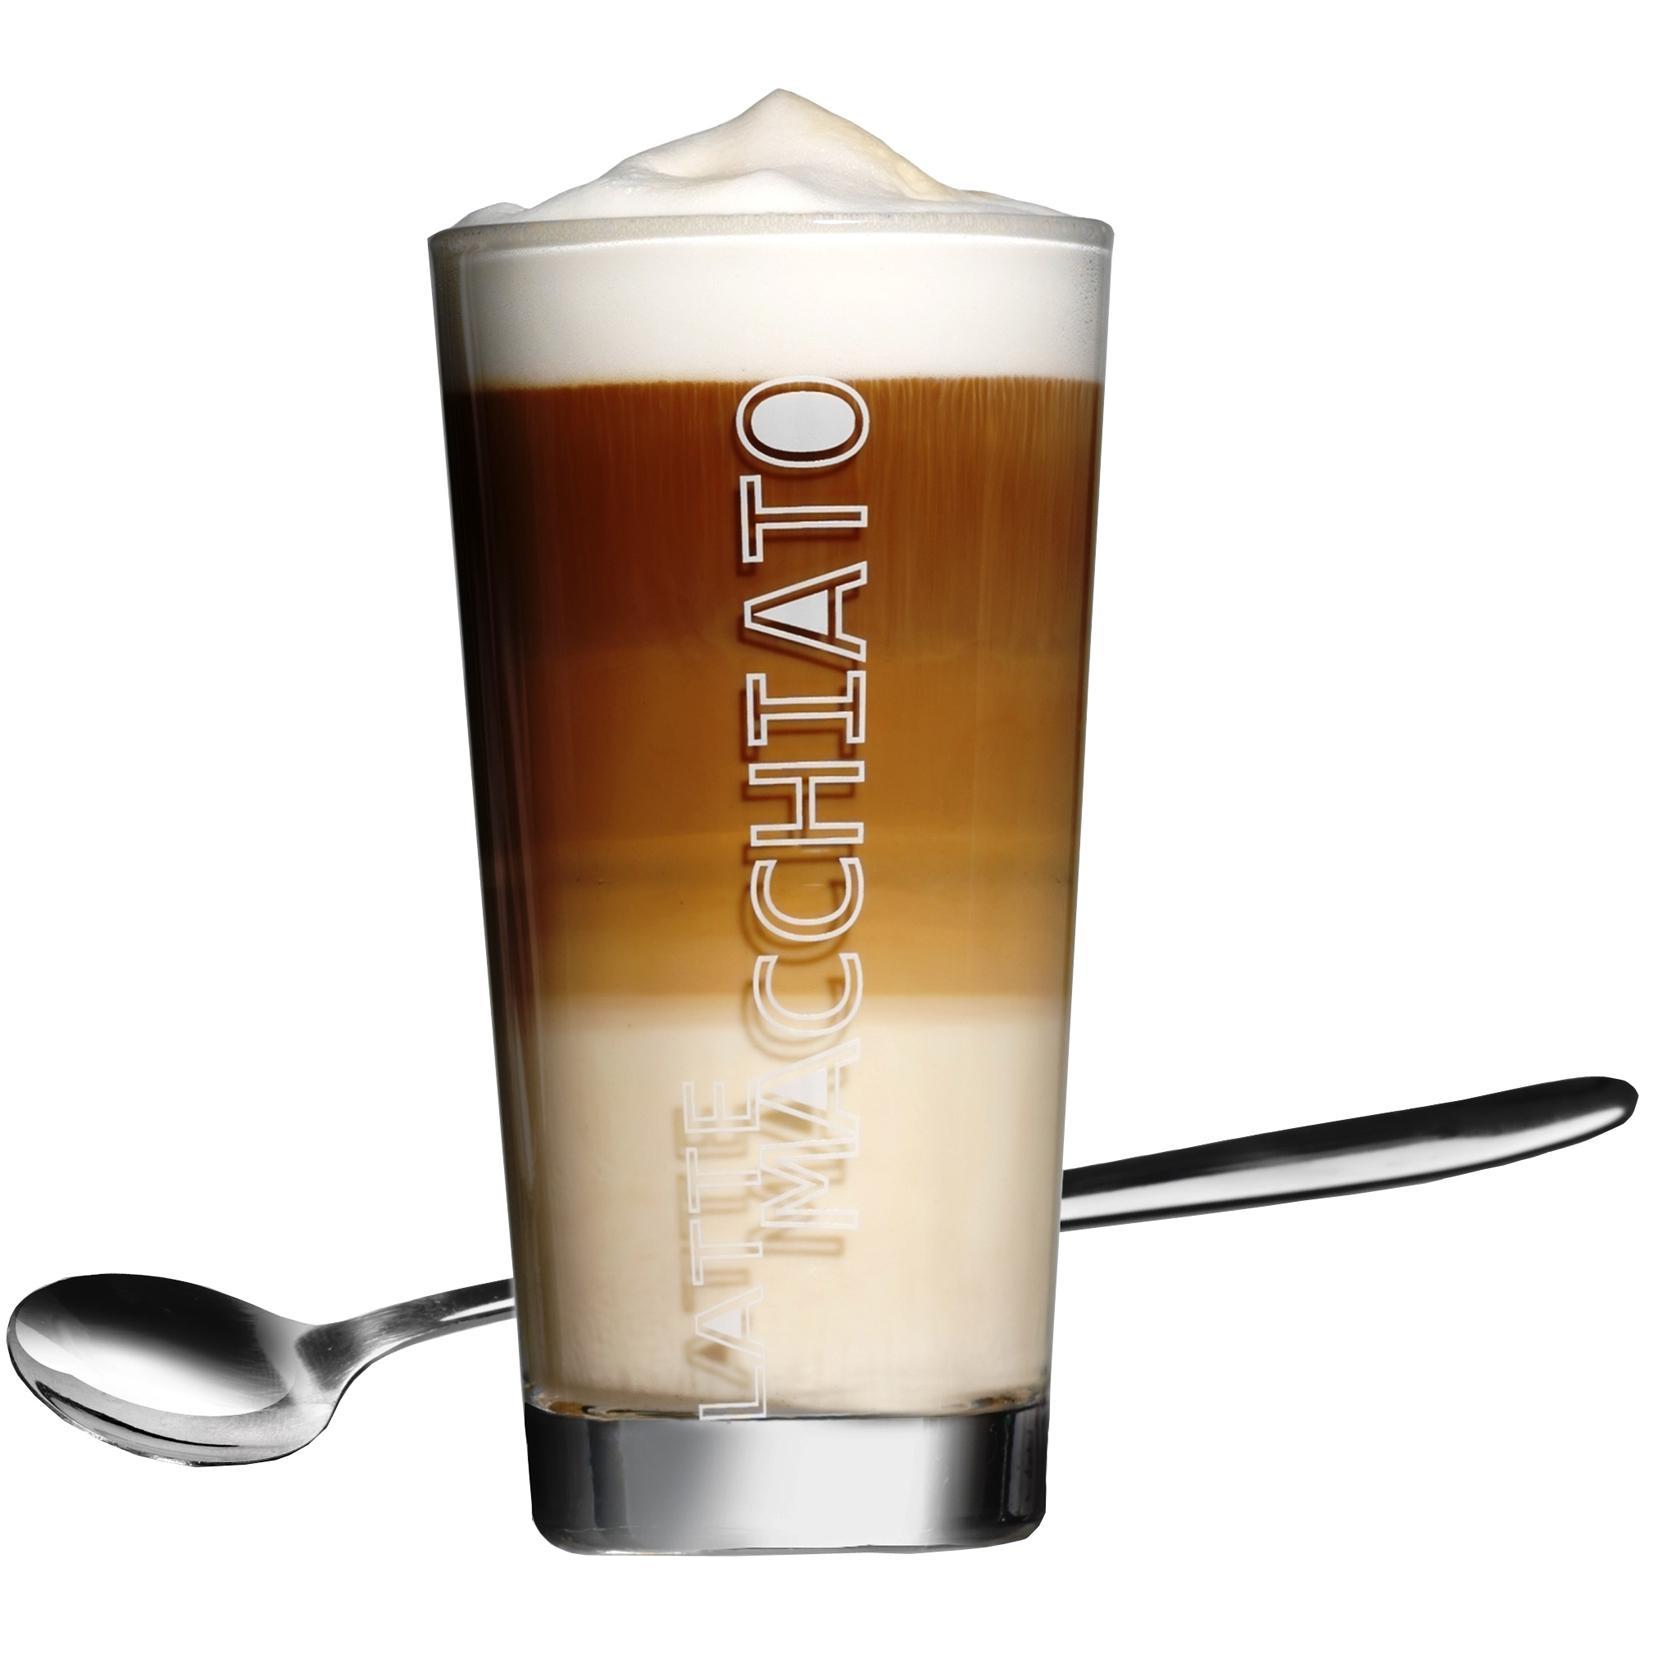 Inspirierend Wandfarbe Latte Macchiato Schema